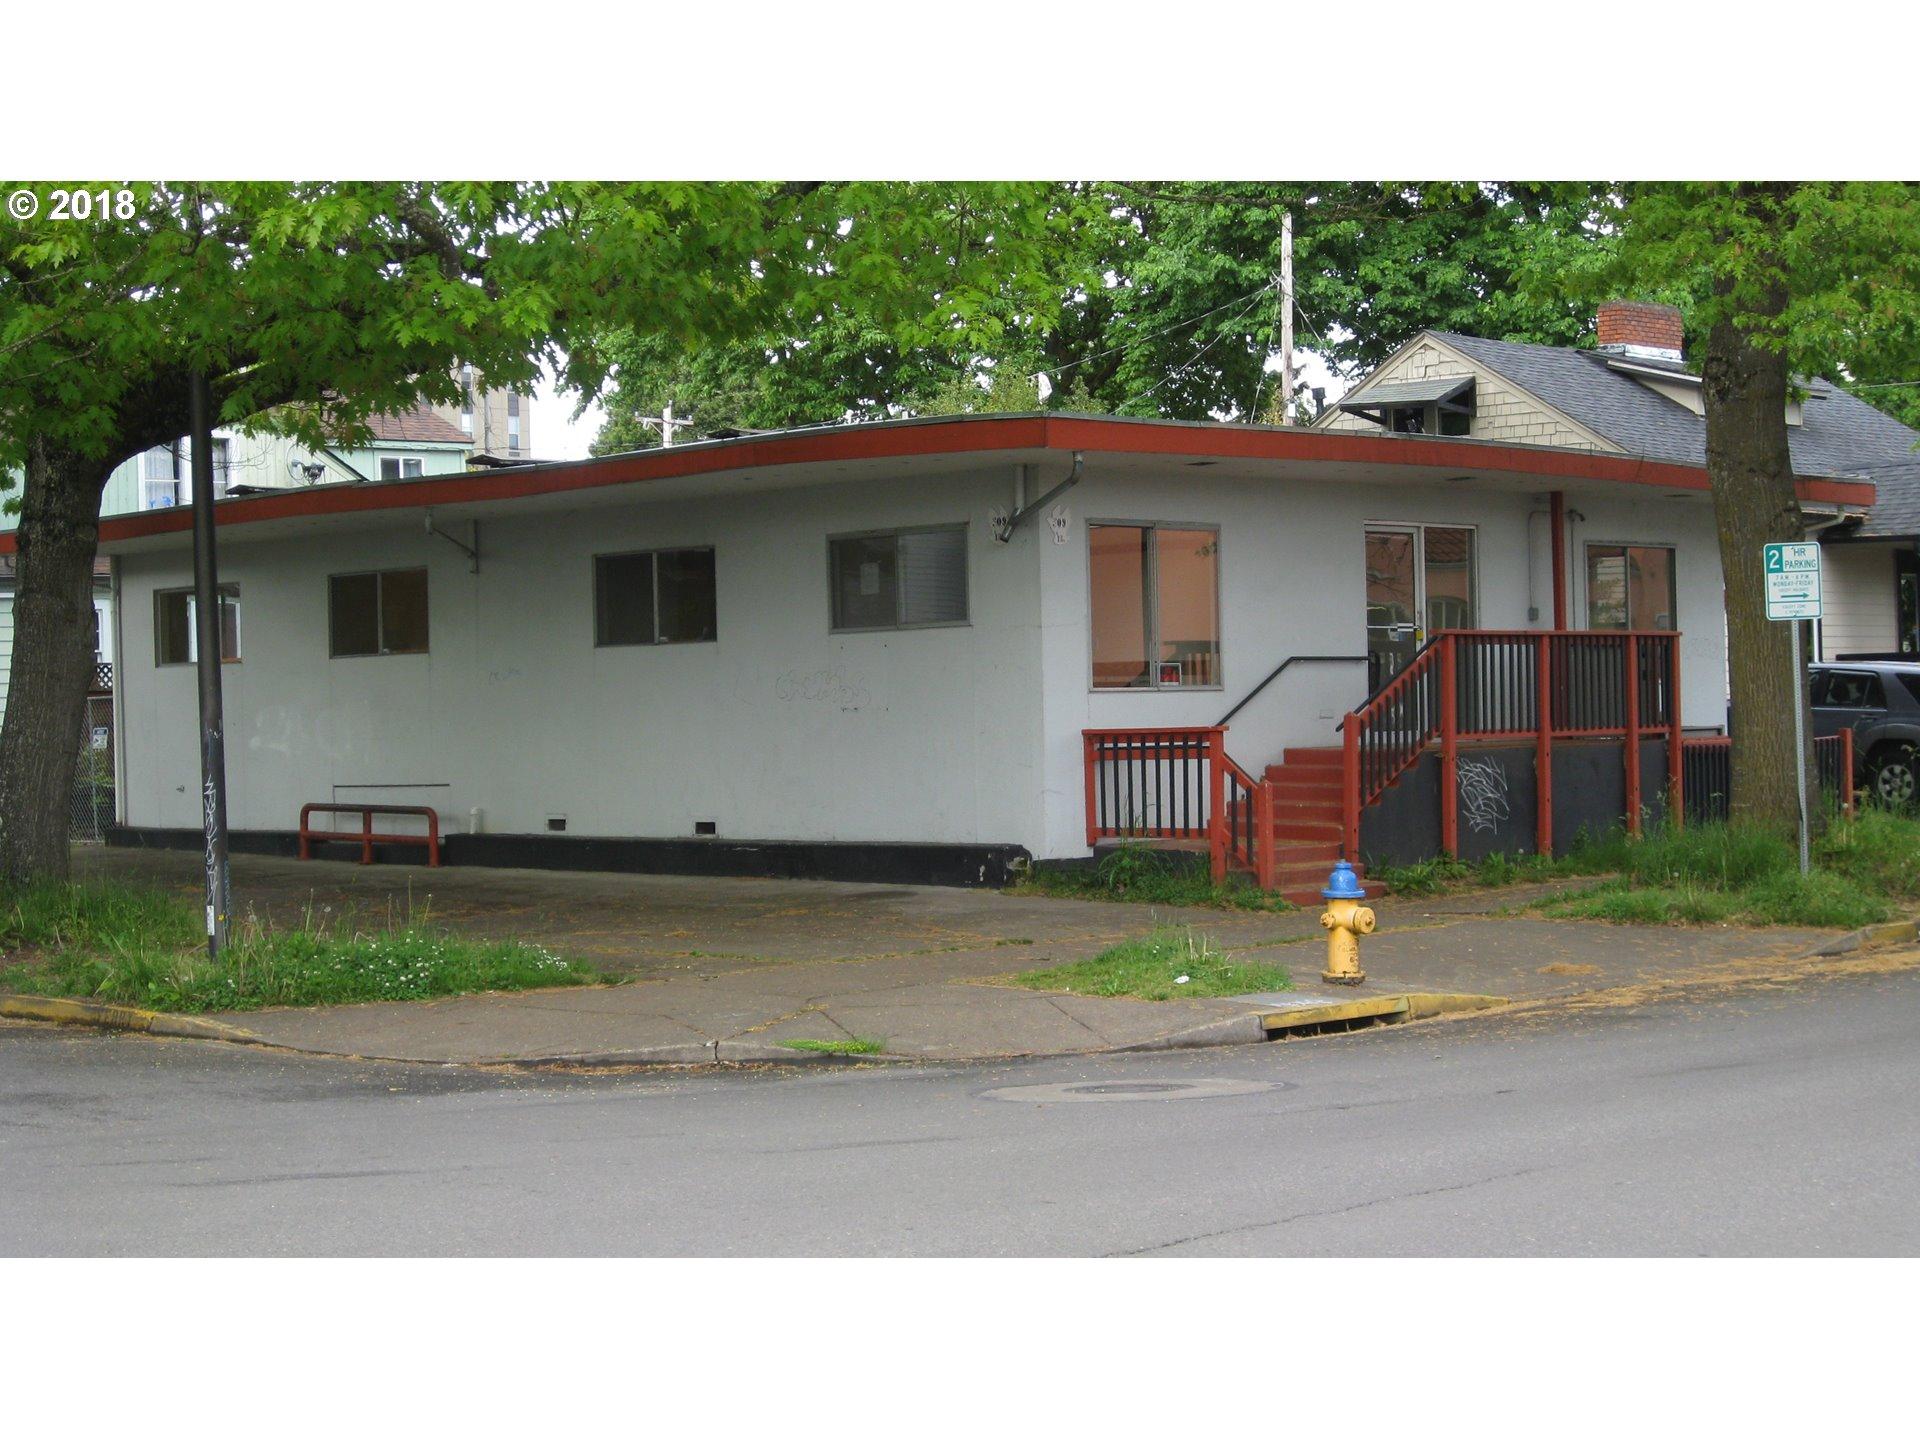 509 E 13th Ave Unit 1 Eugene, OR 97401 - MLS #: 18106959